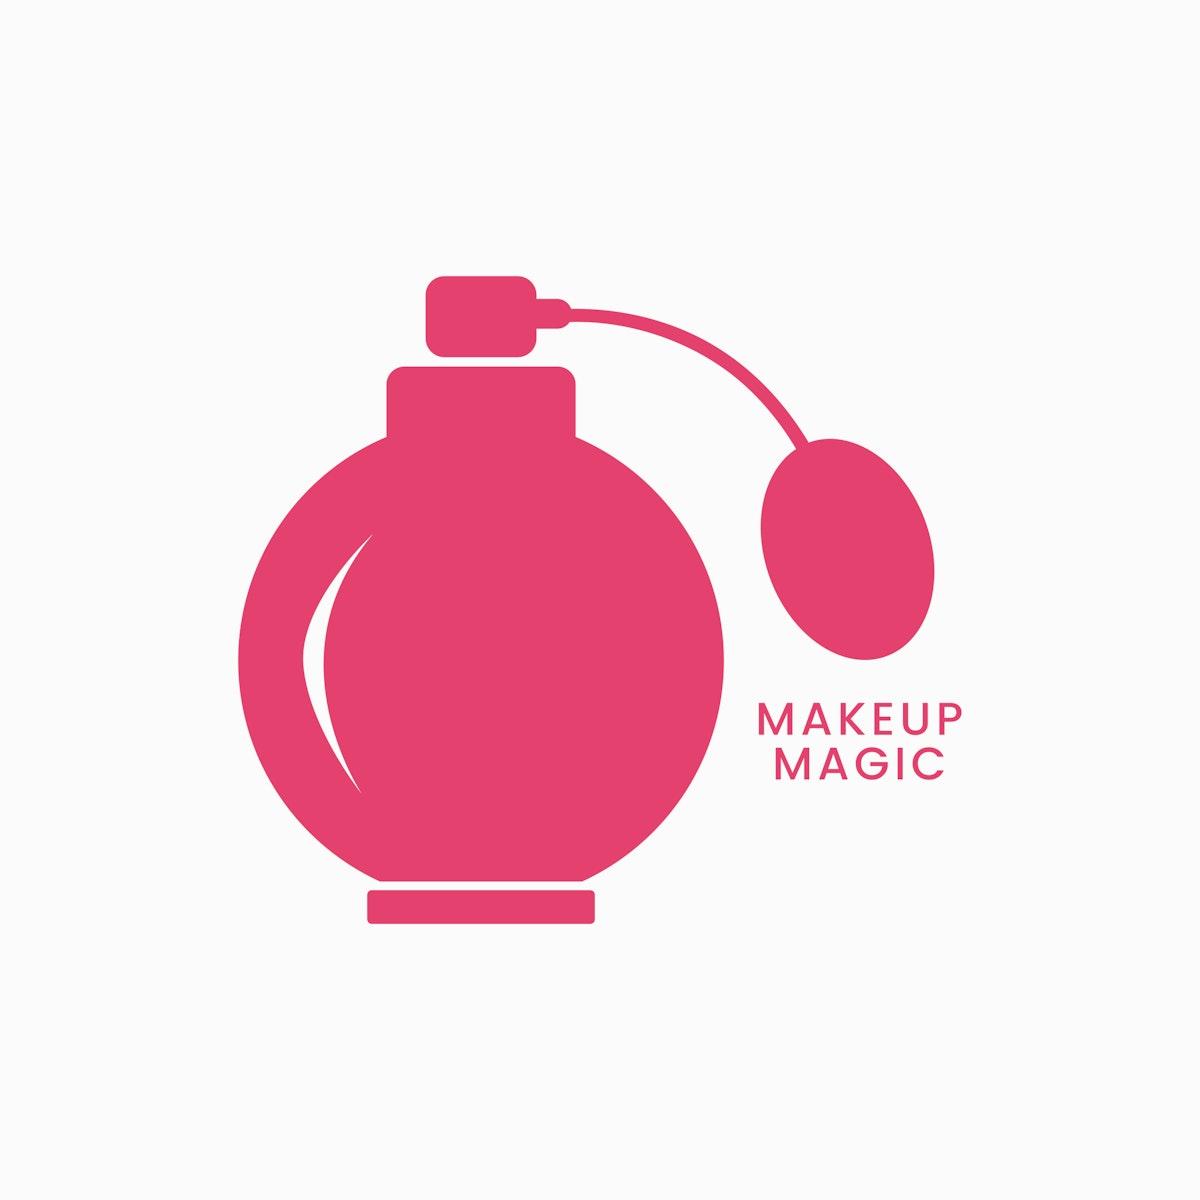 Pink atomizer perfume bottle icon